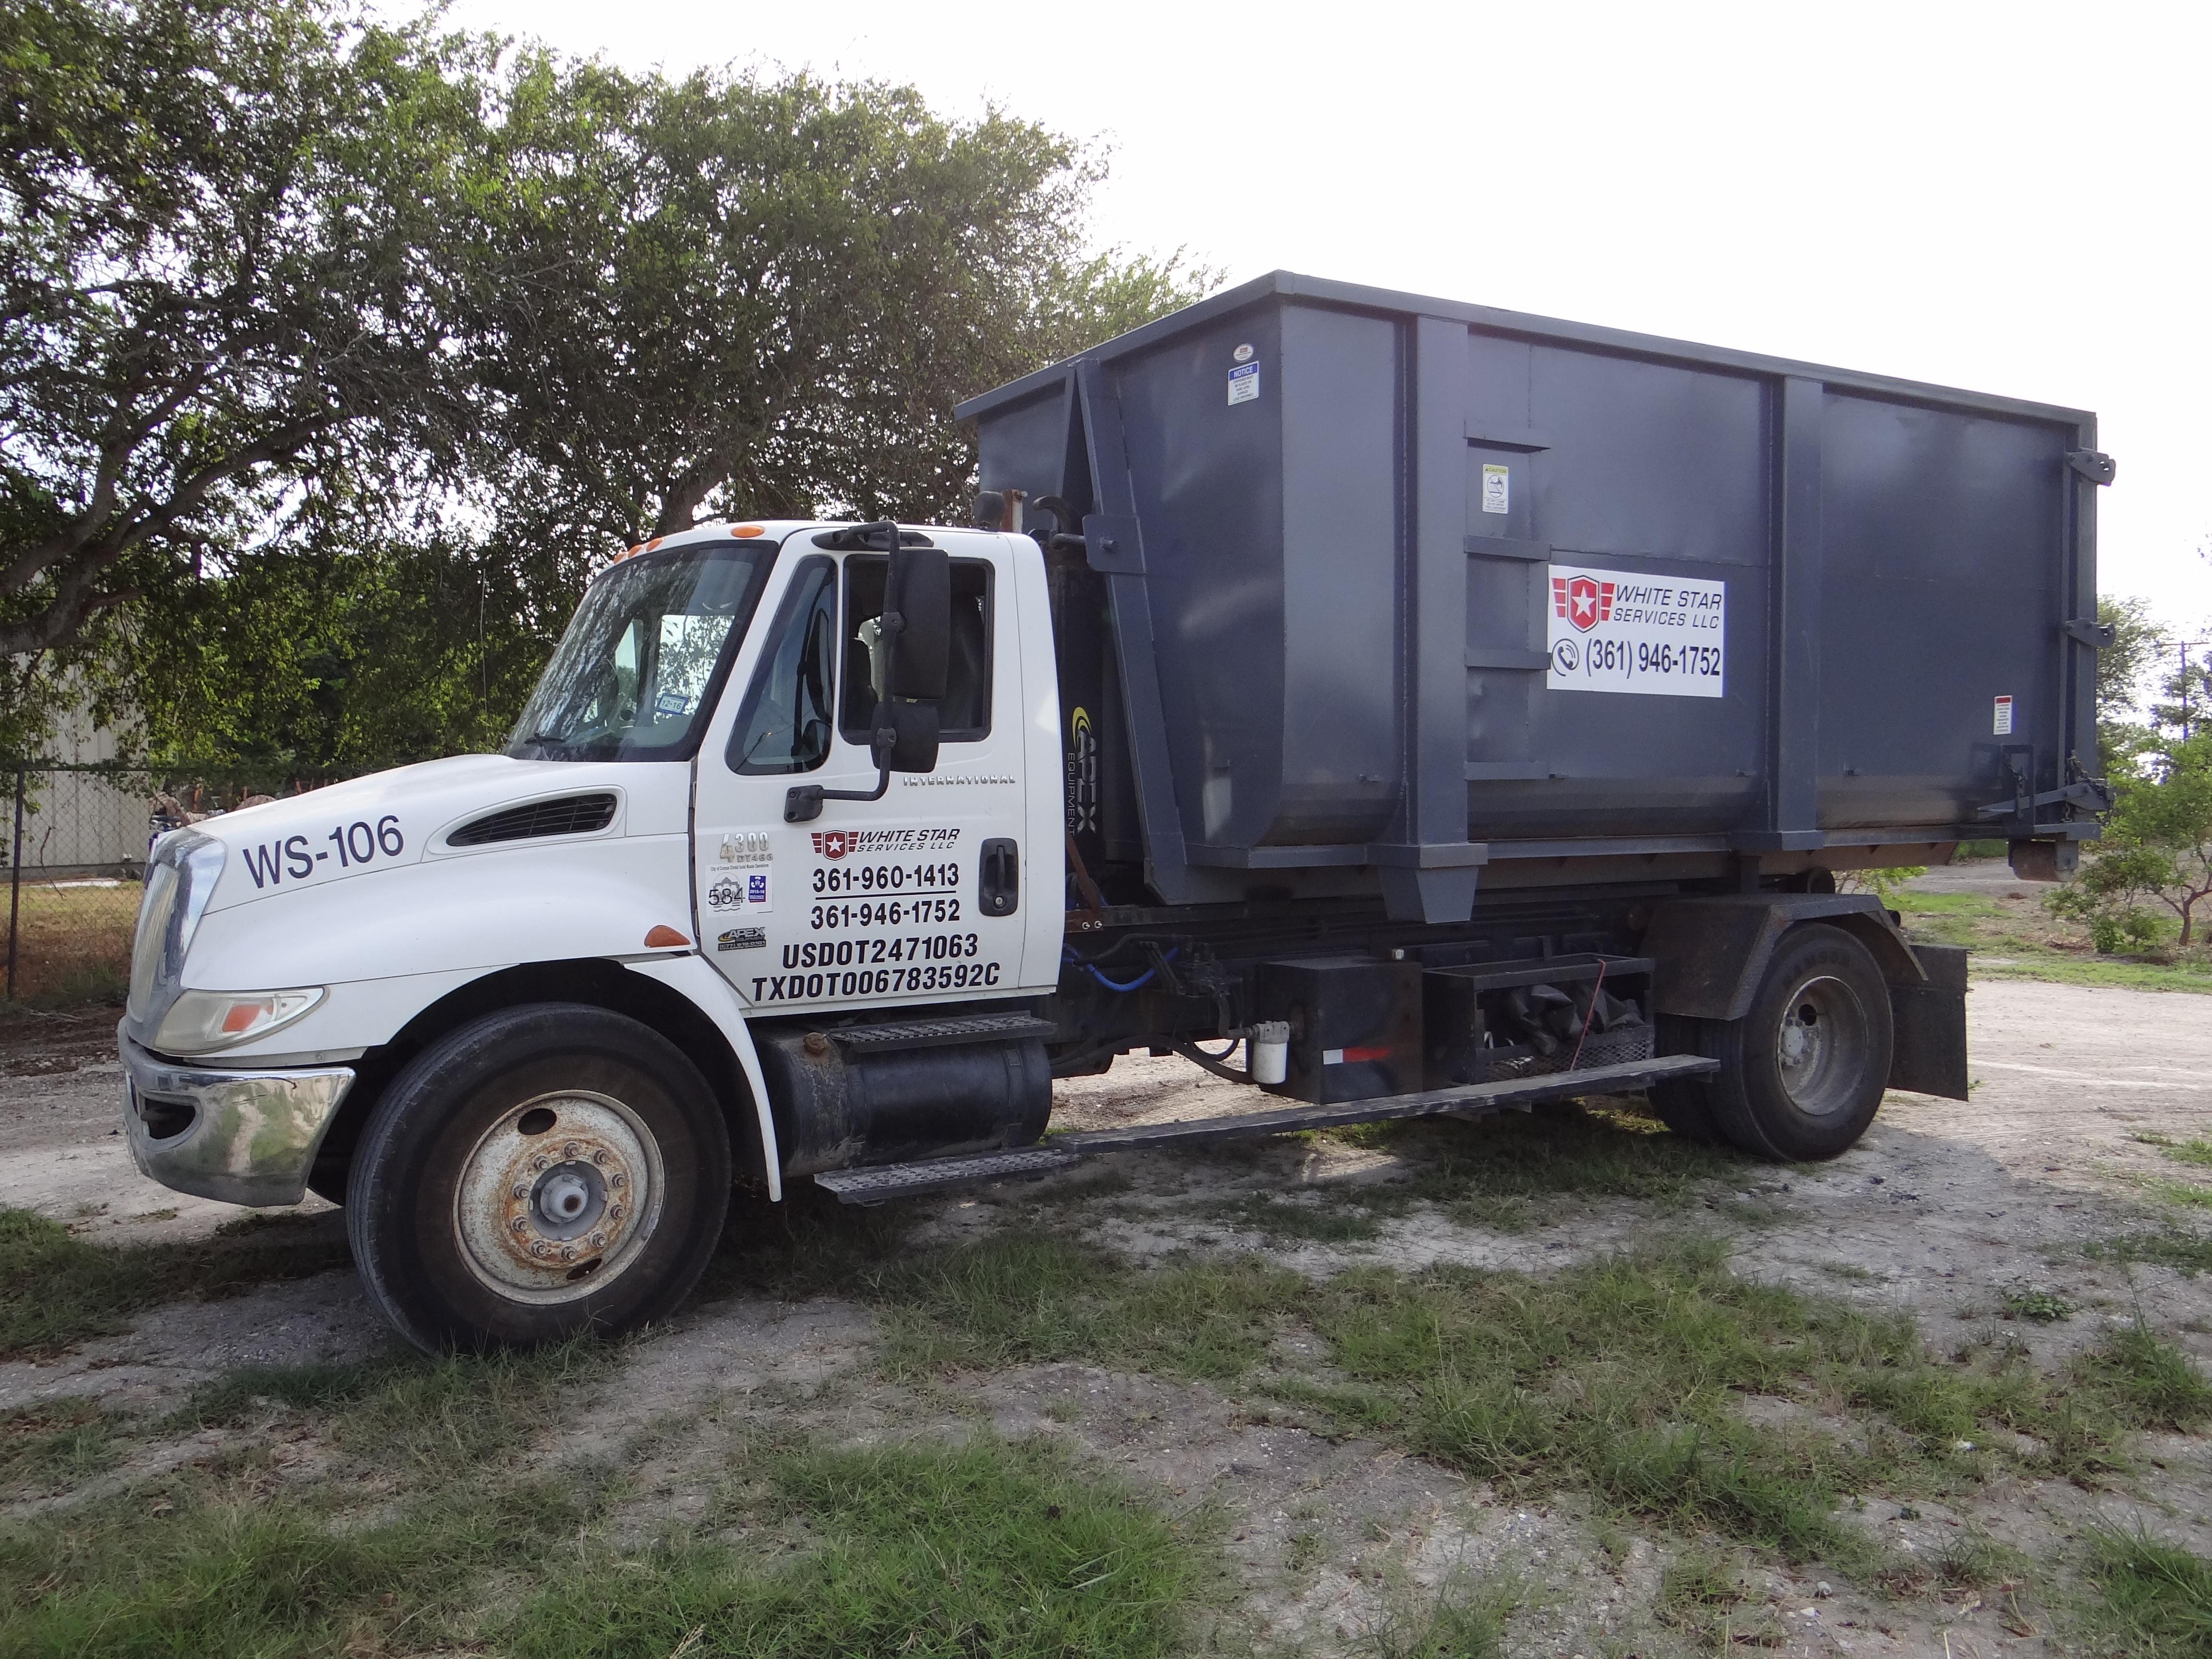 White Star Services LLC Corpus Christi (361)946-1750